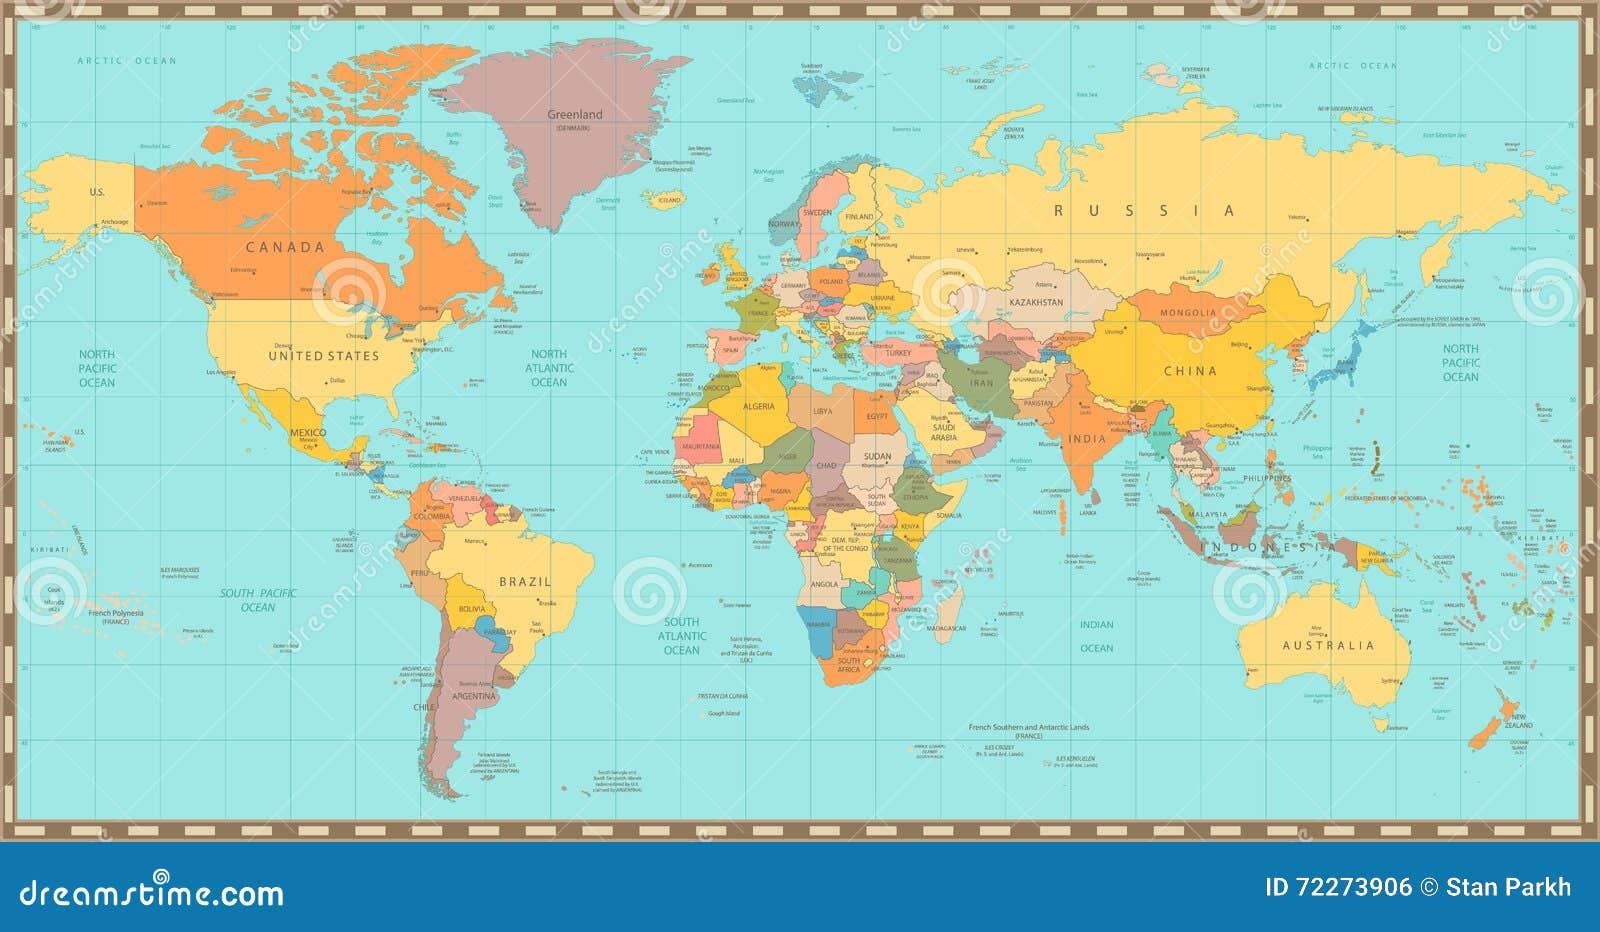 Old vintage color political world map stock vector - Papel pintado mapa del mundo ...